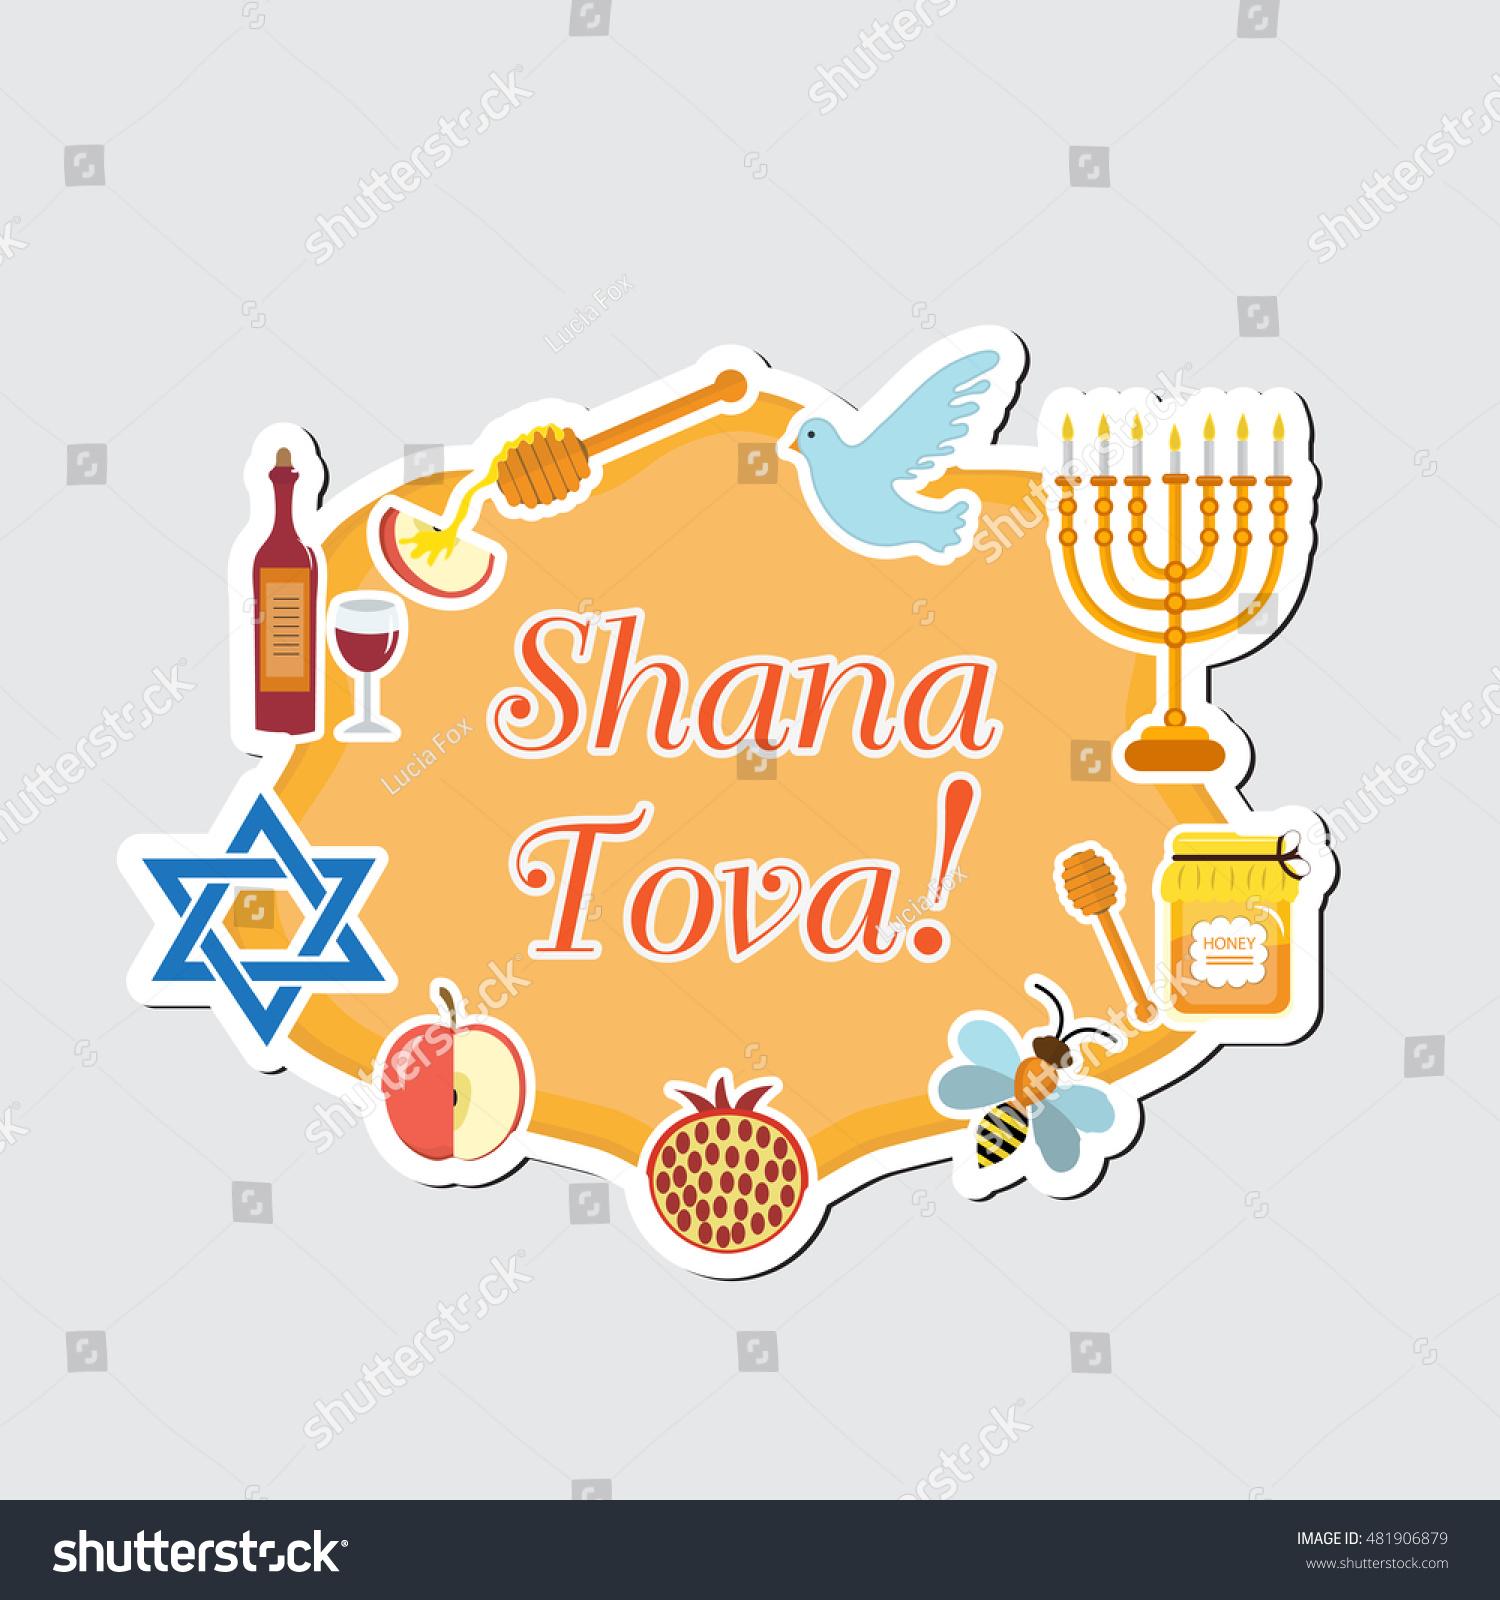 Greeting card inscription shana tova greeting stock vector greeting card with the inscription shana tova greeting card for the jewish new year kristyandbryce Images